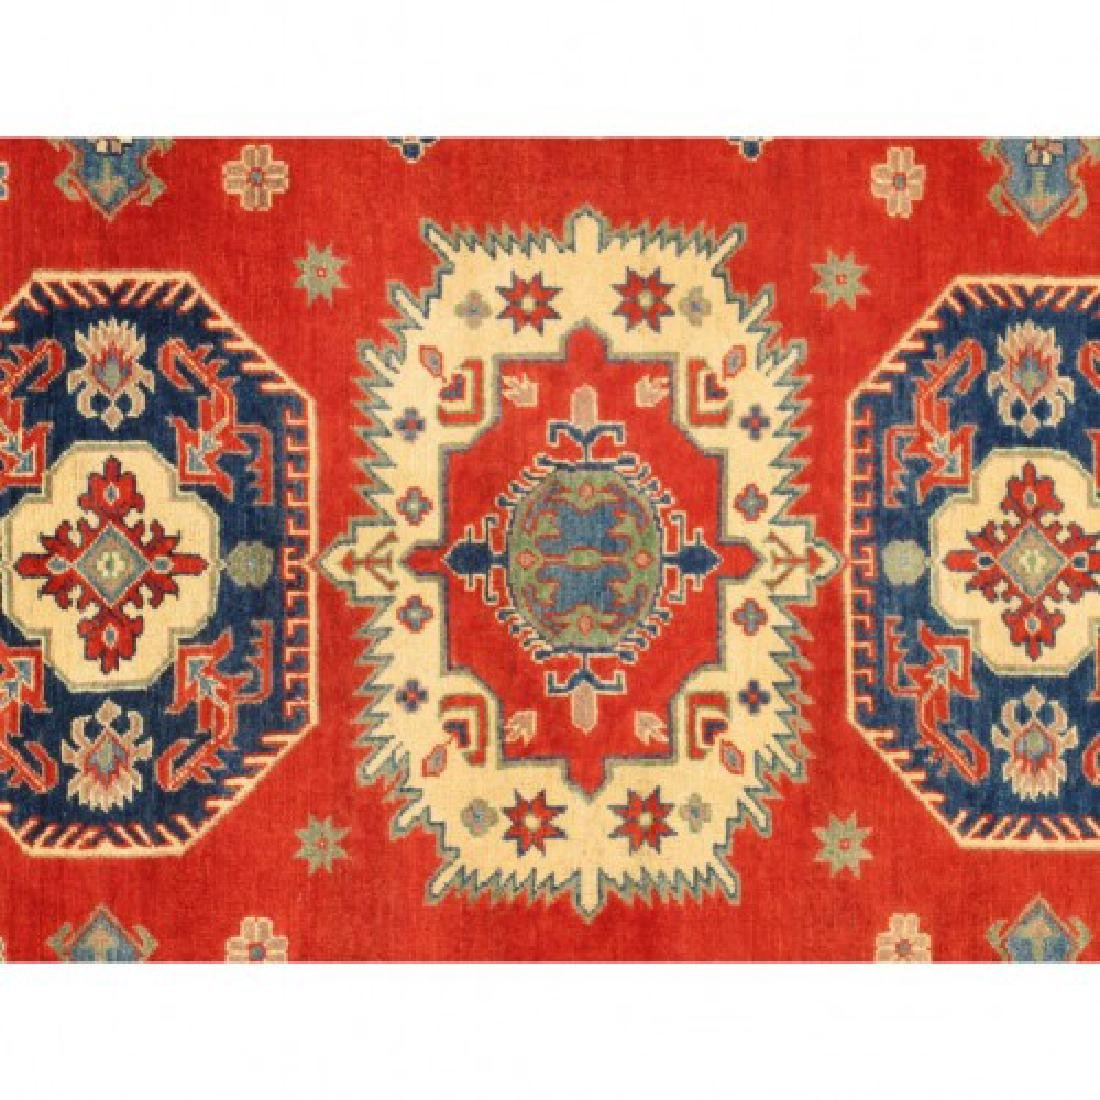 Hand Knotted Wool Kazak Rug 9x10 - 7